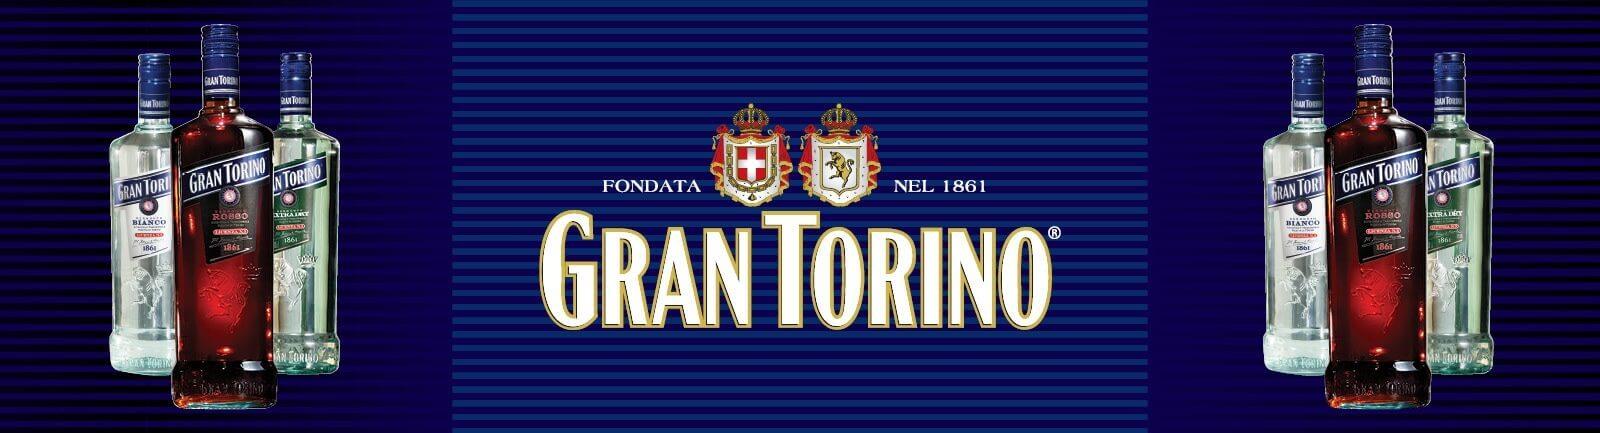 brand-page-banner-gran-torino.jpg